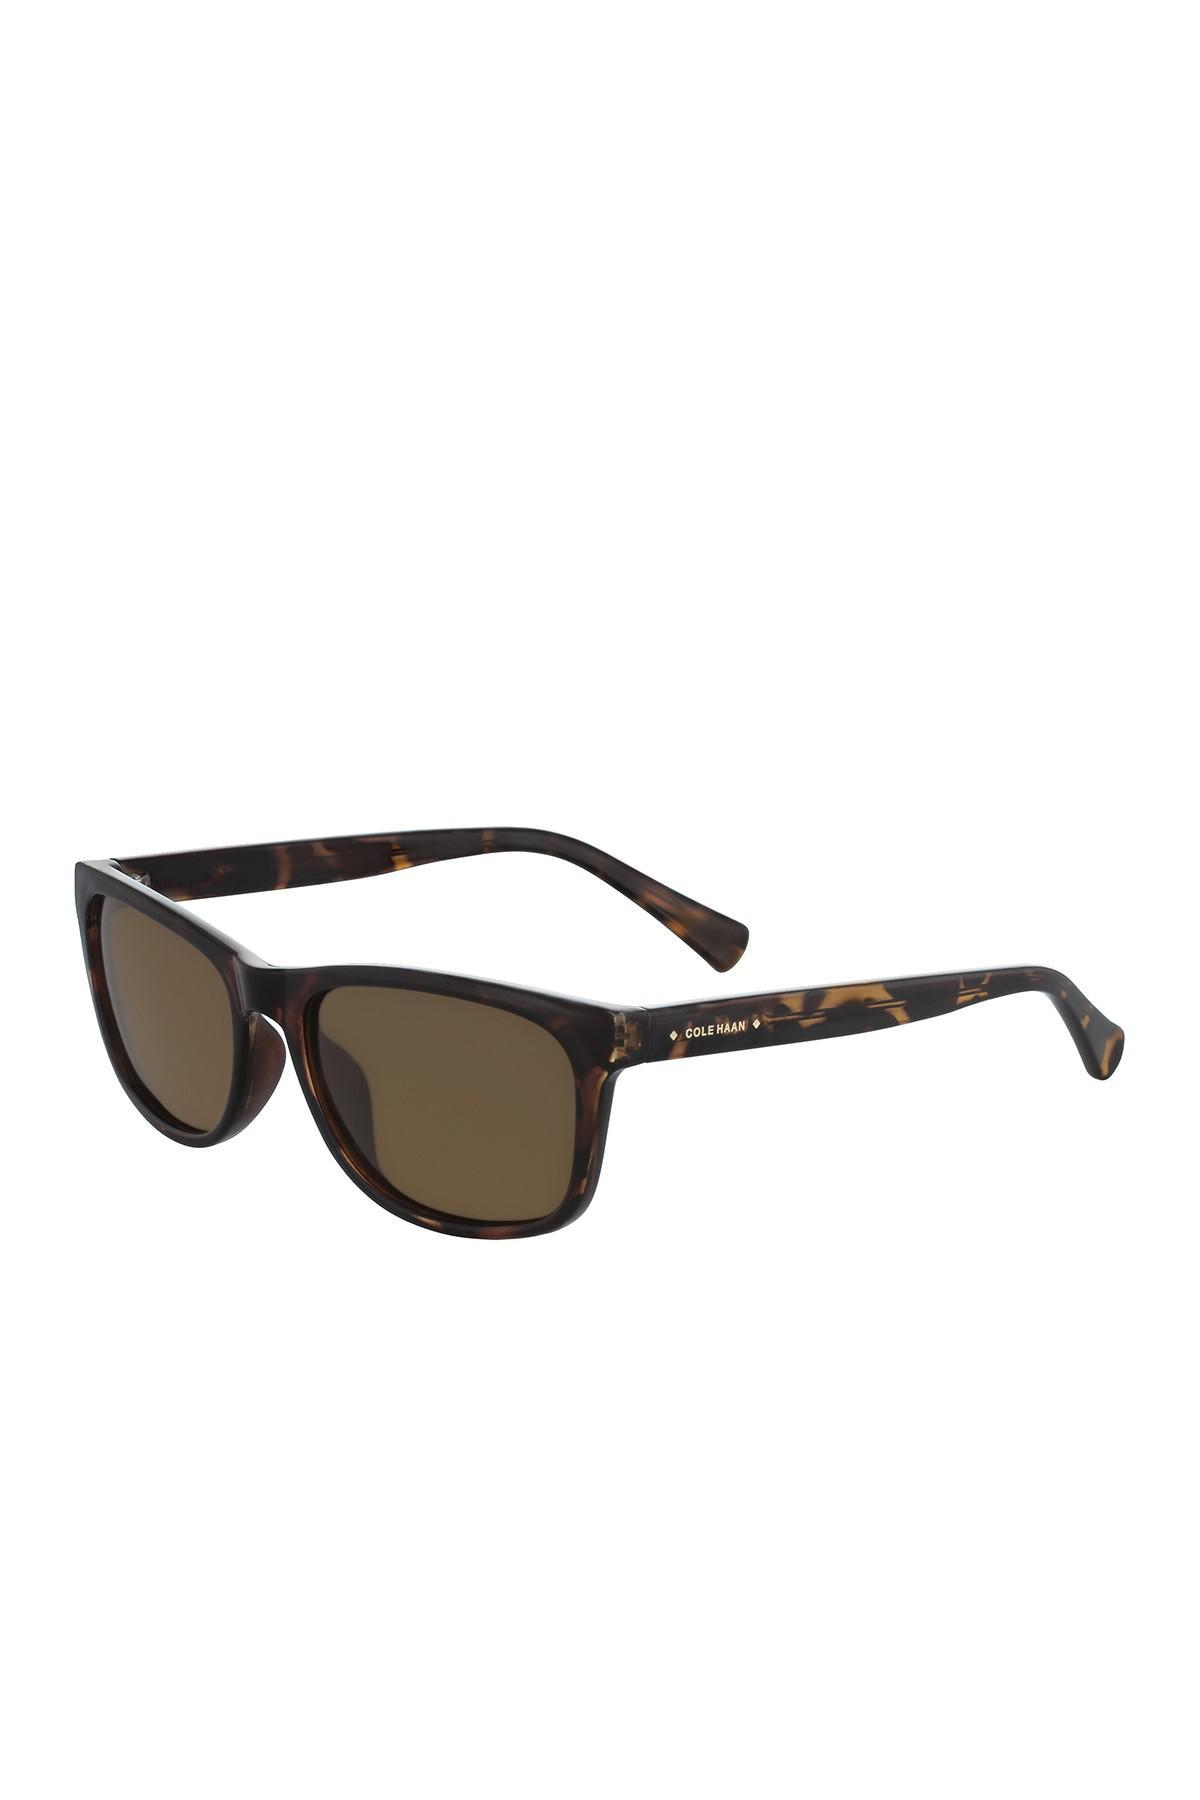 Lyst - Cole Haan Men\'s Retro Acetate Frame Sunglasses in Brown for Men